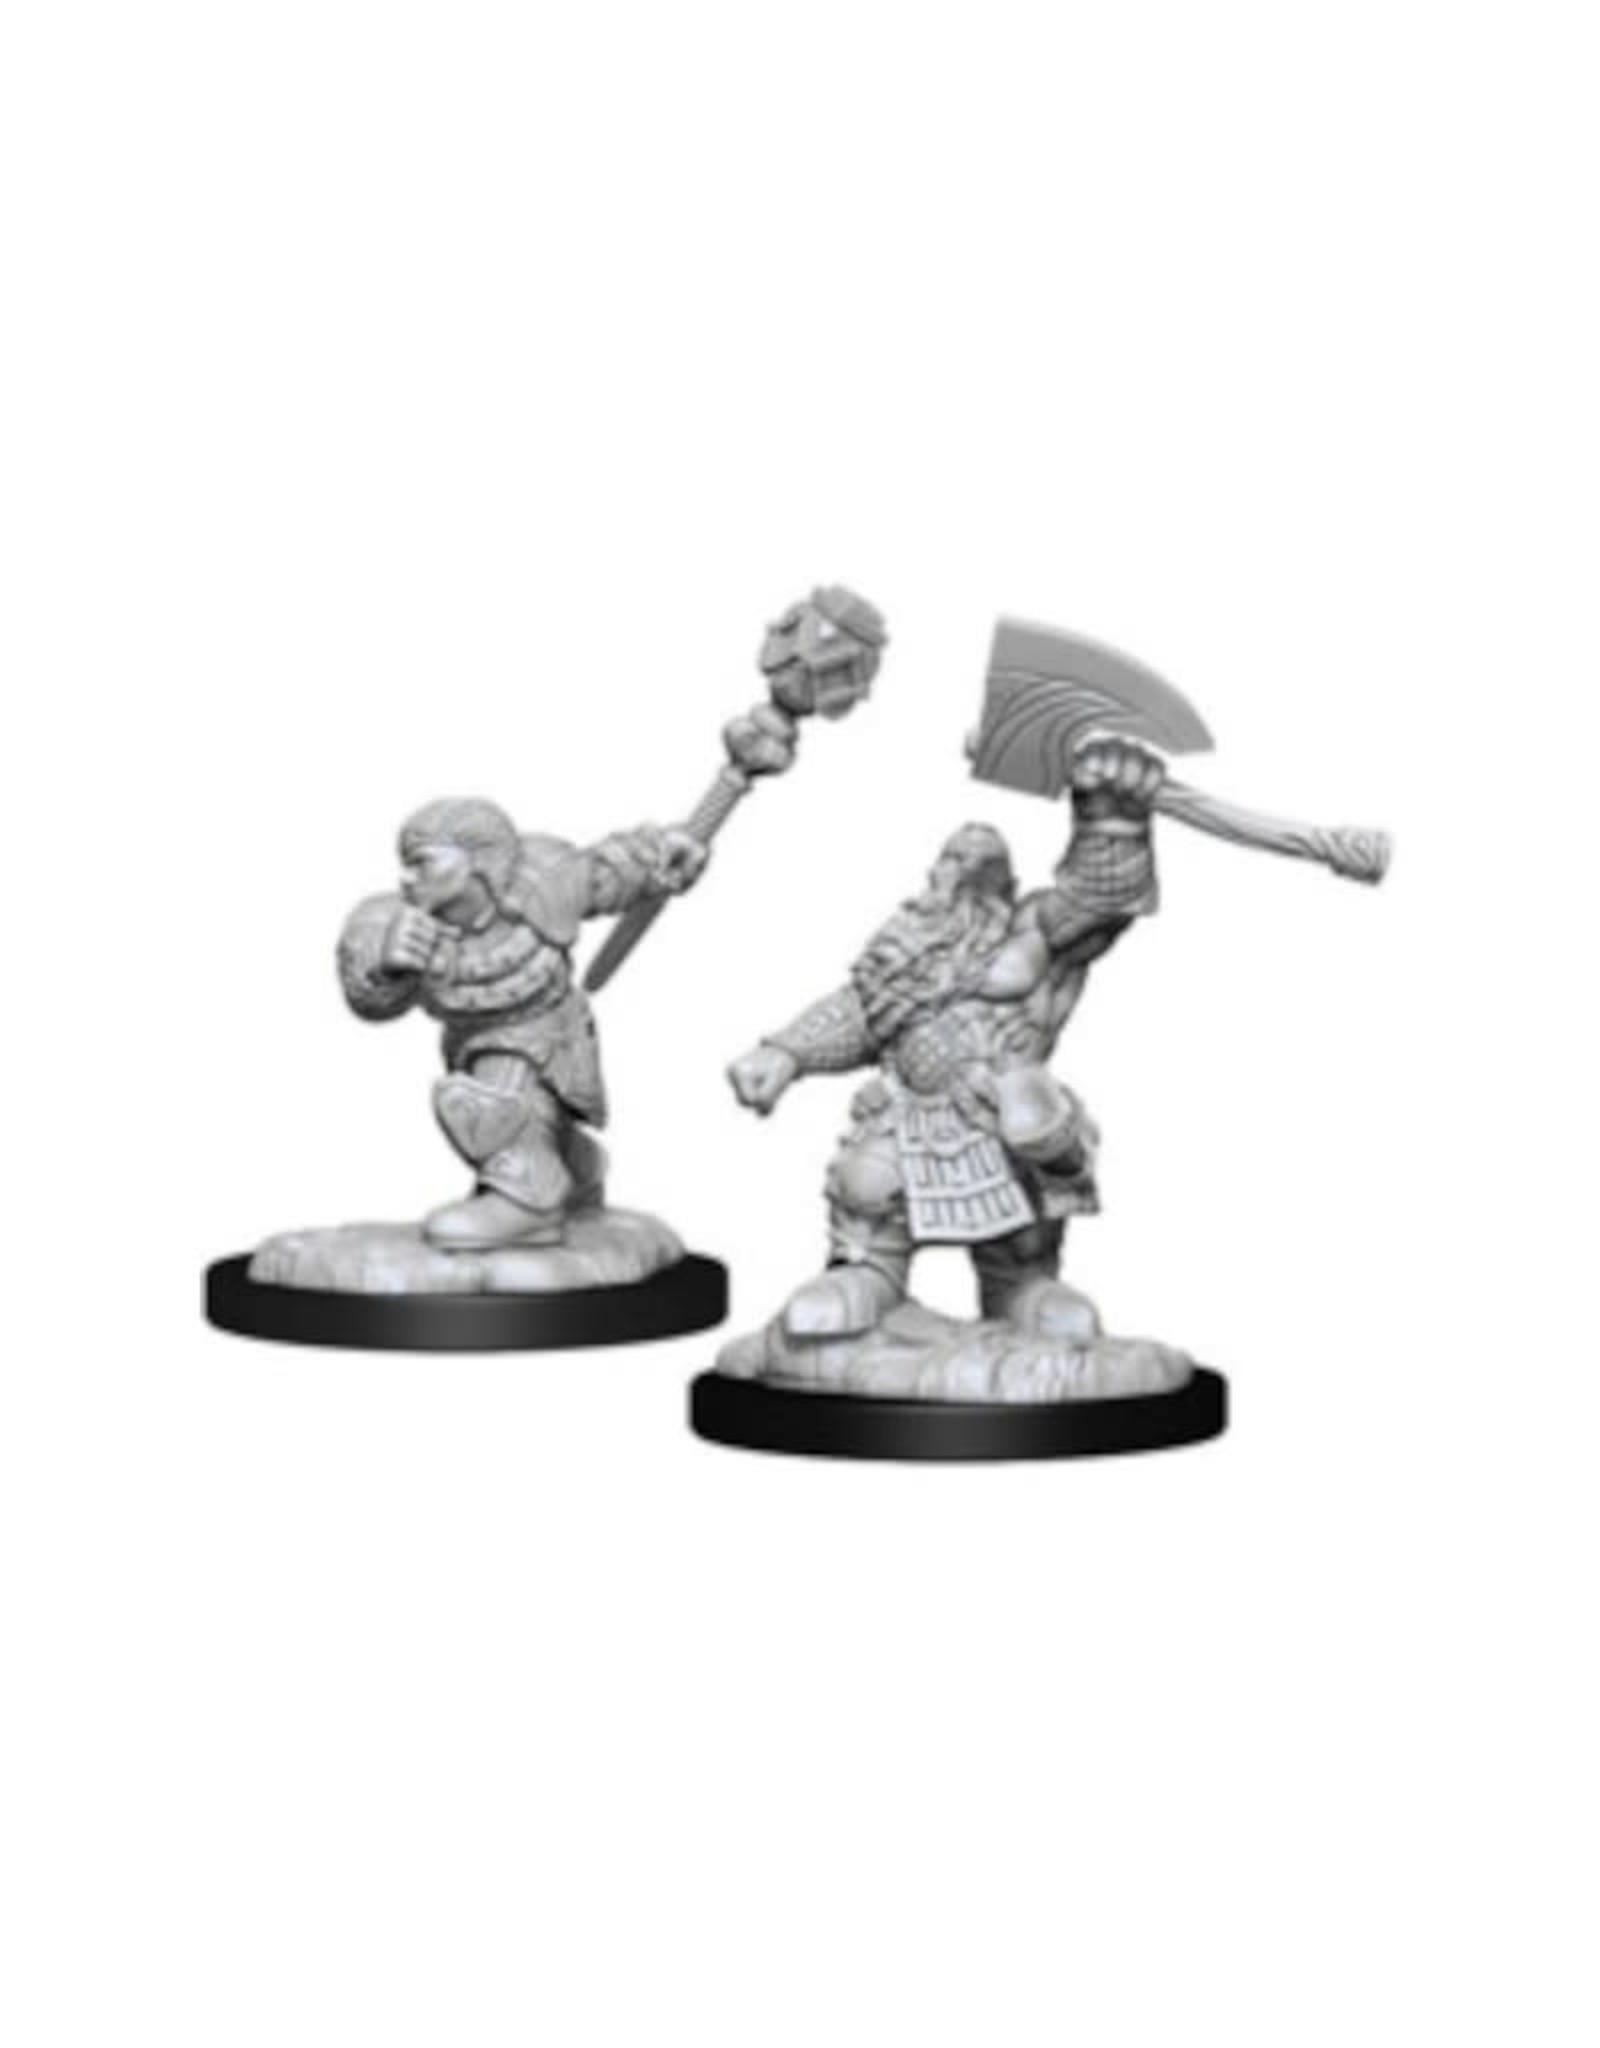 Wizkids MTG Unpainted Mini: Dwarf Fighter & Cleric